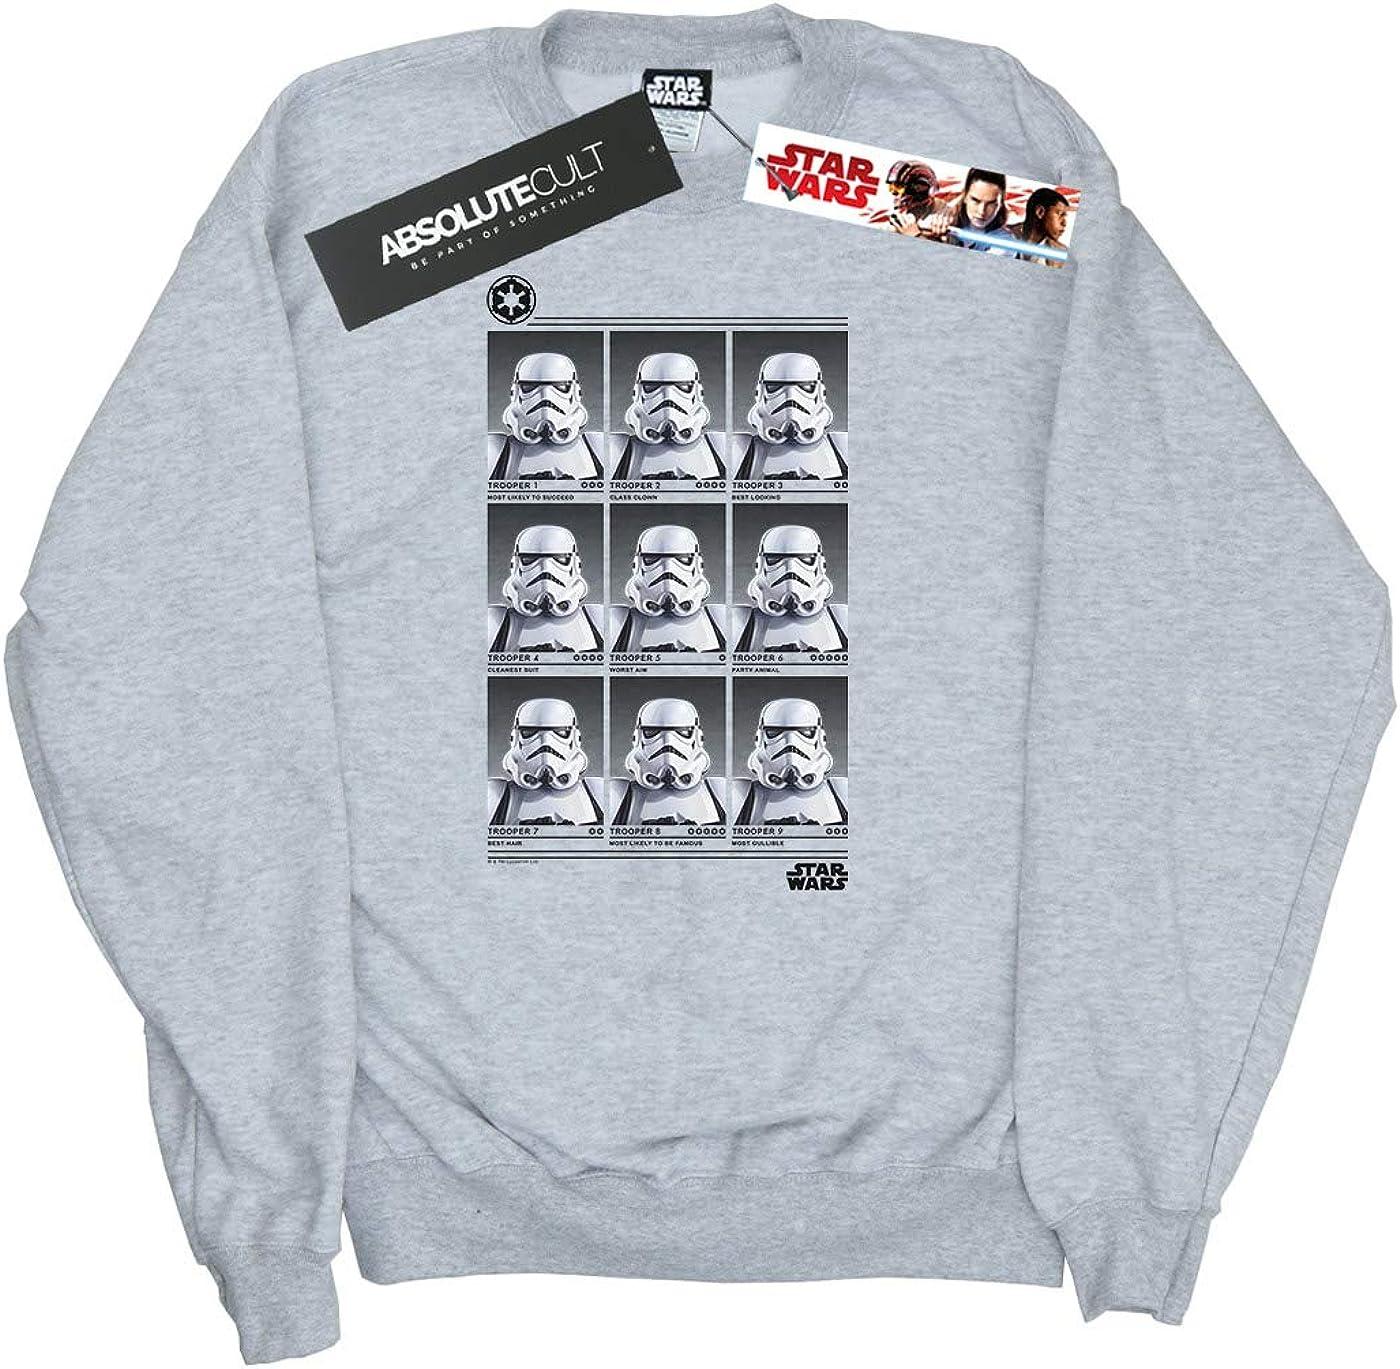 Star Wars Girls Stormtrooper Yearbook Sweatshirt